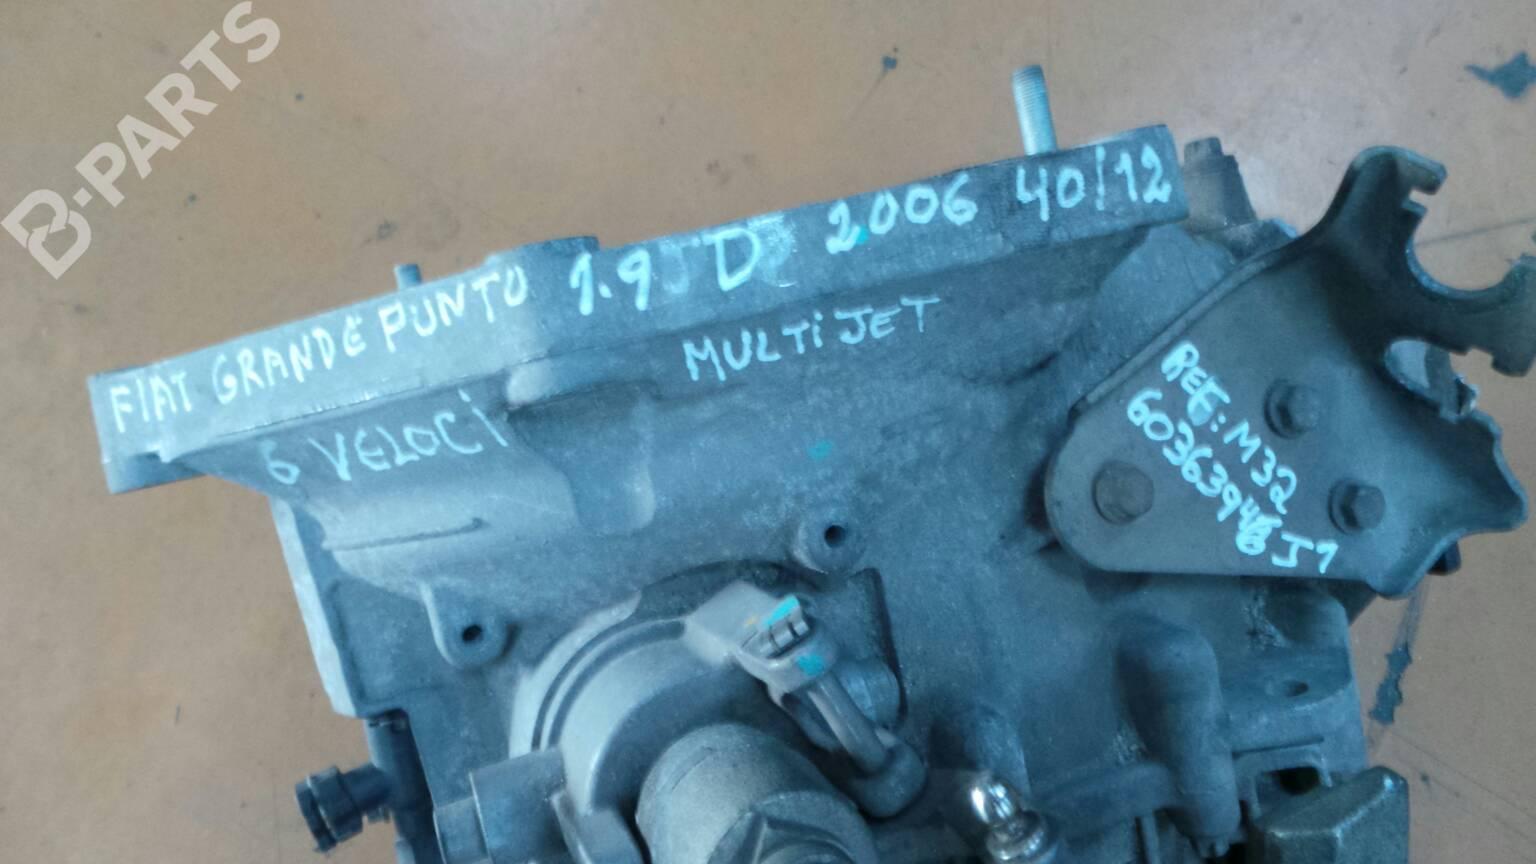 Manual Gearbox Fiat Grande Punto 199 19 D Multijet 28236 Fuse Box M32 60363946j1 130hp